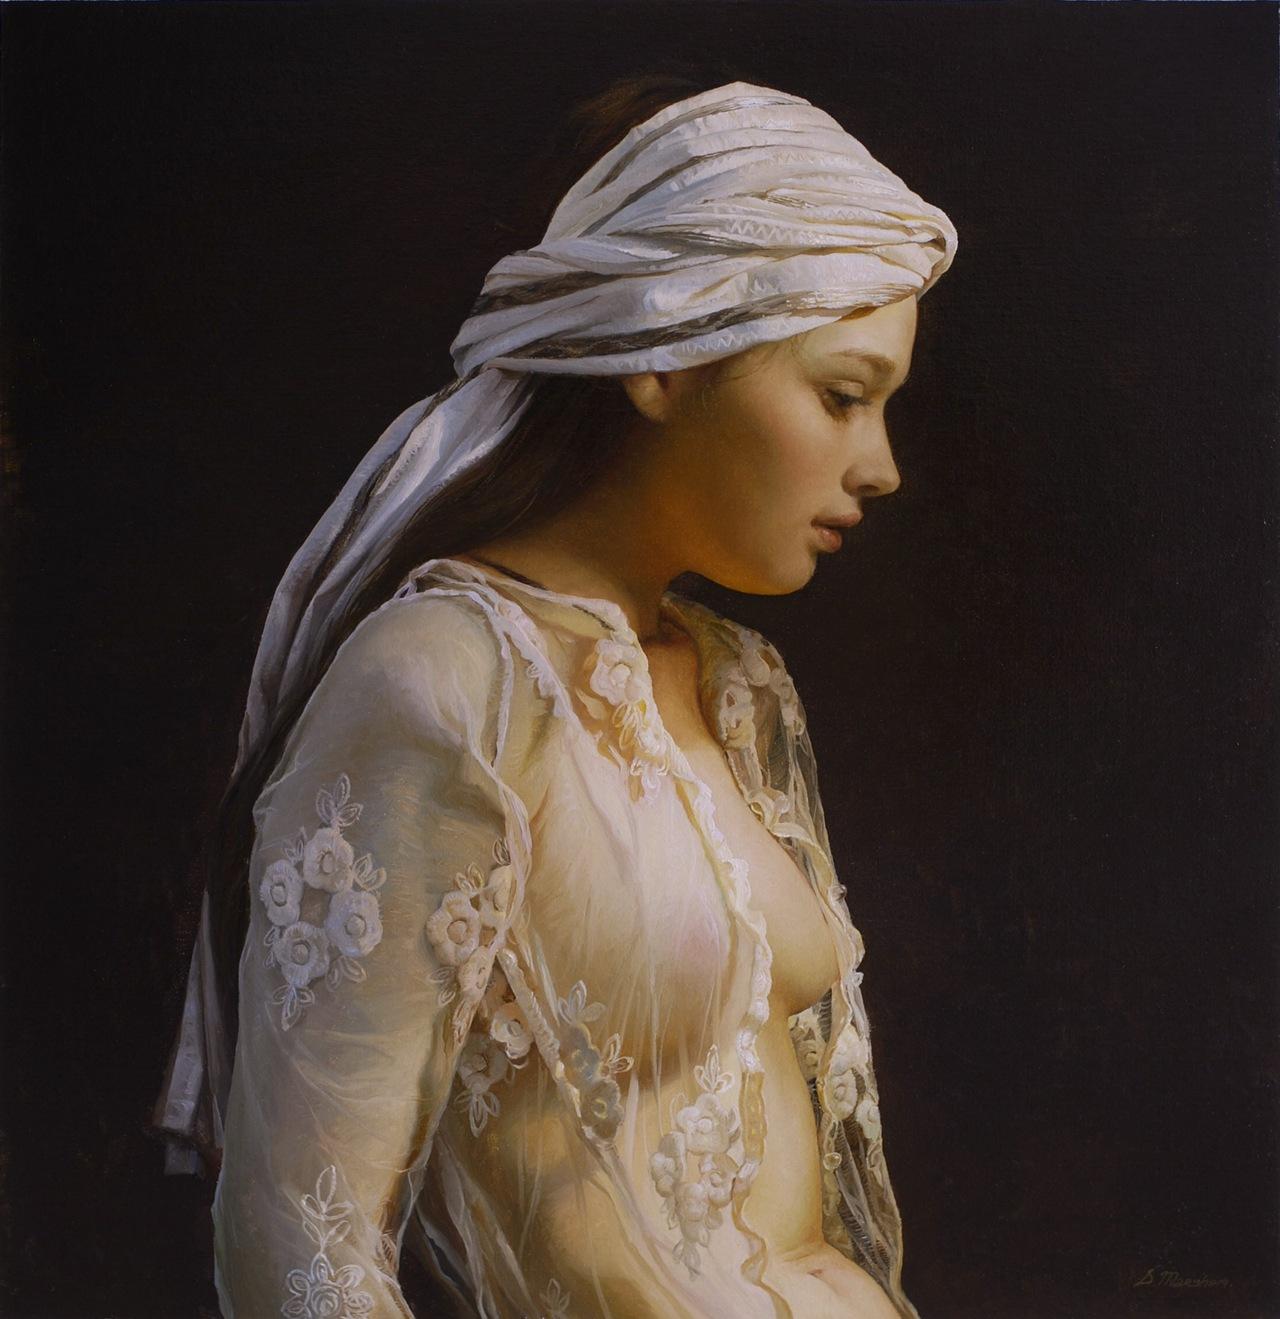 Women's images by a Russian realist artist Sergey Marshennikov - 19